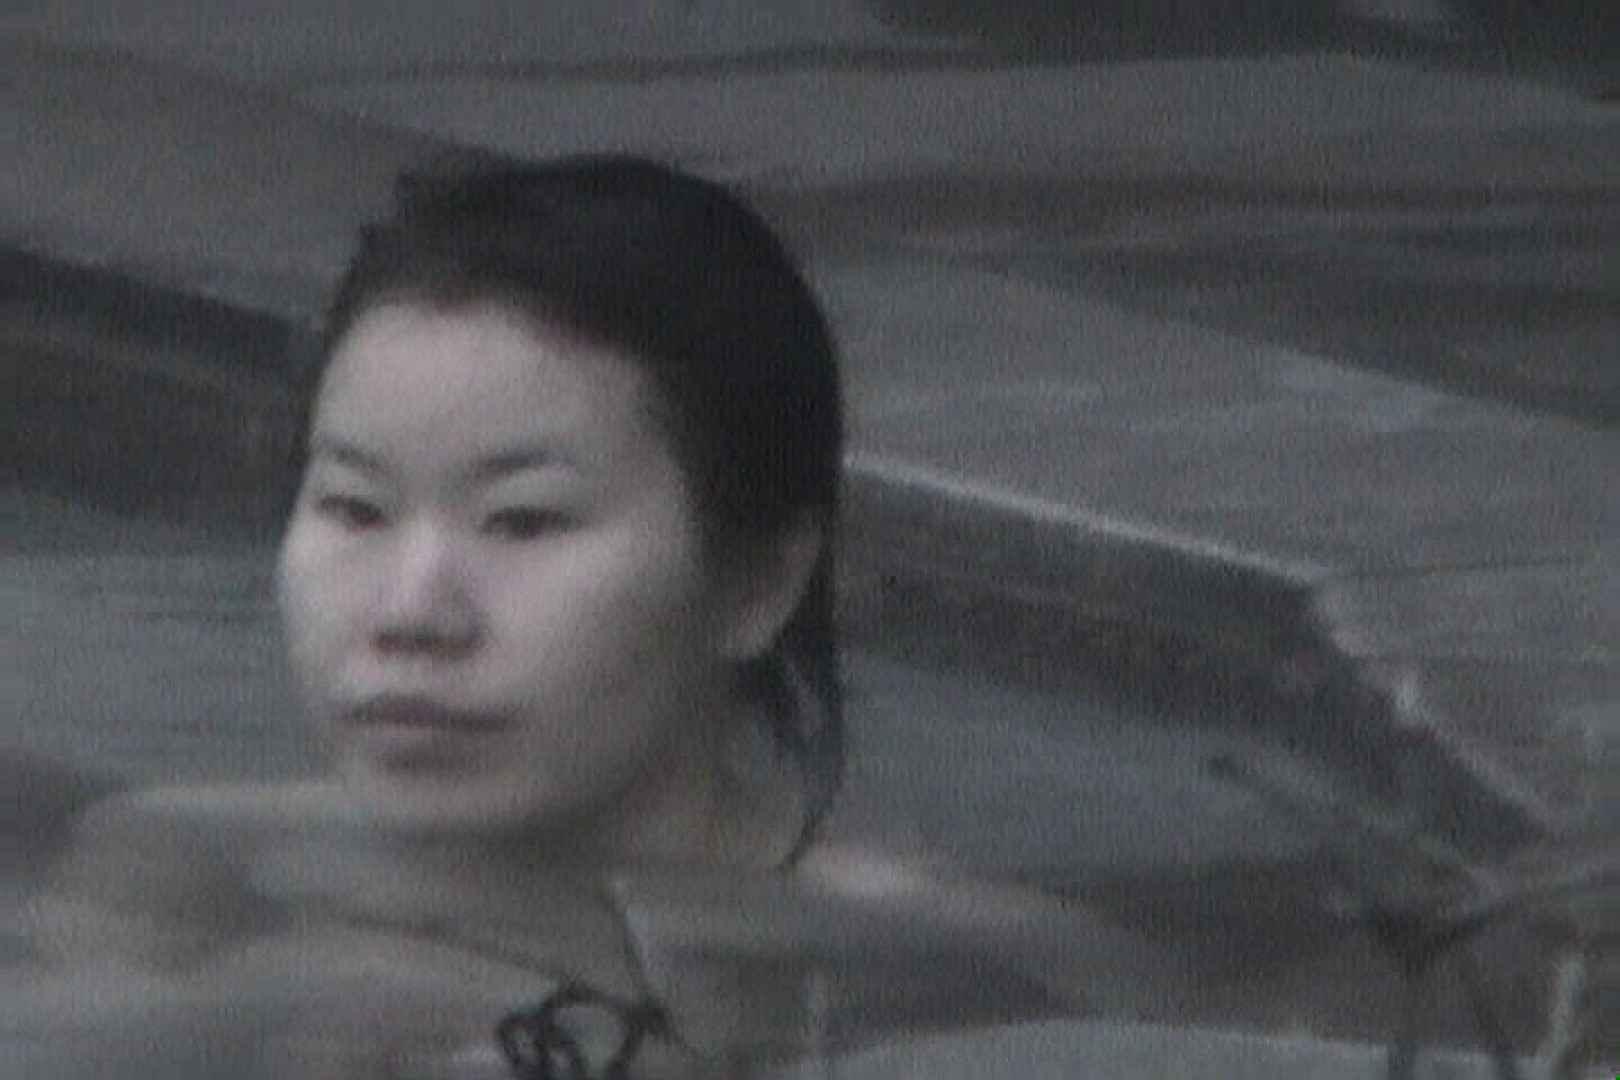 Aquaな露天風呂Vol.556 露天風呂編  99PIX 22